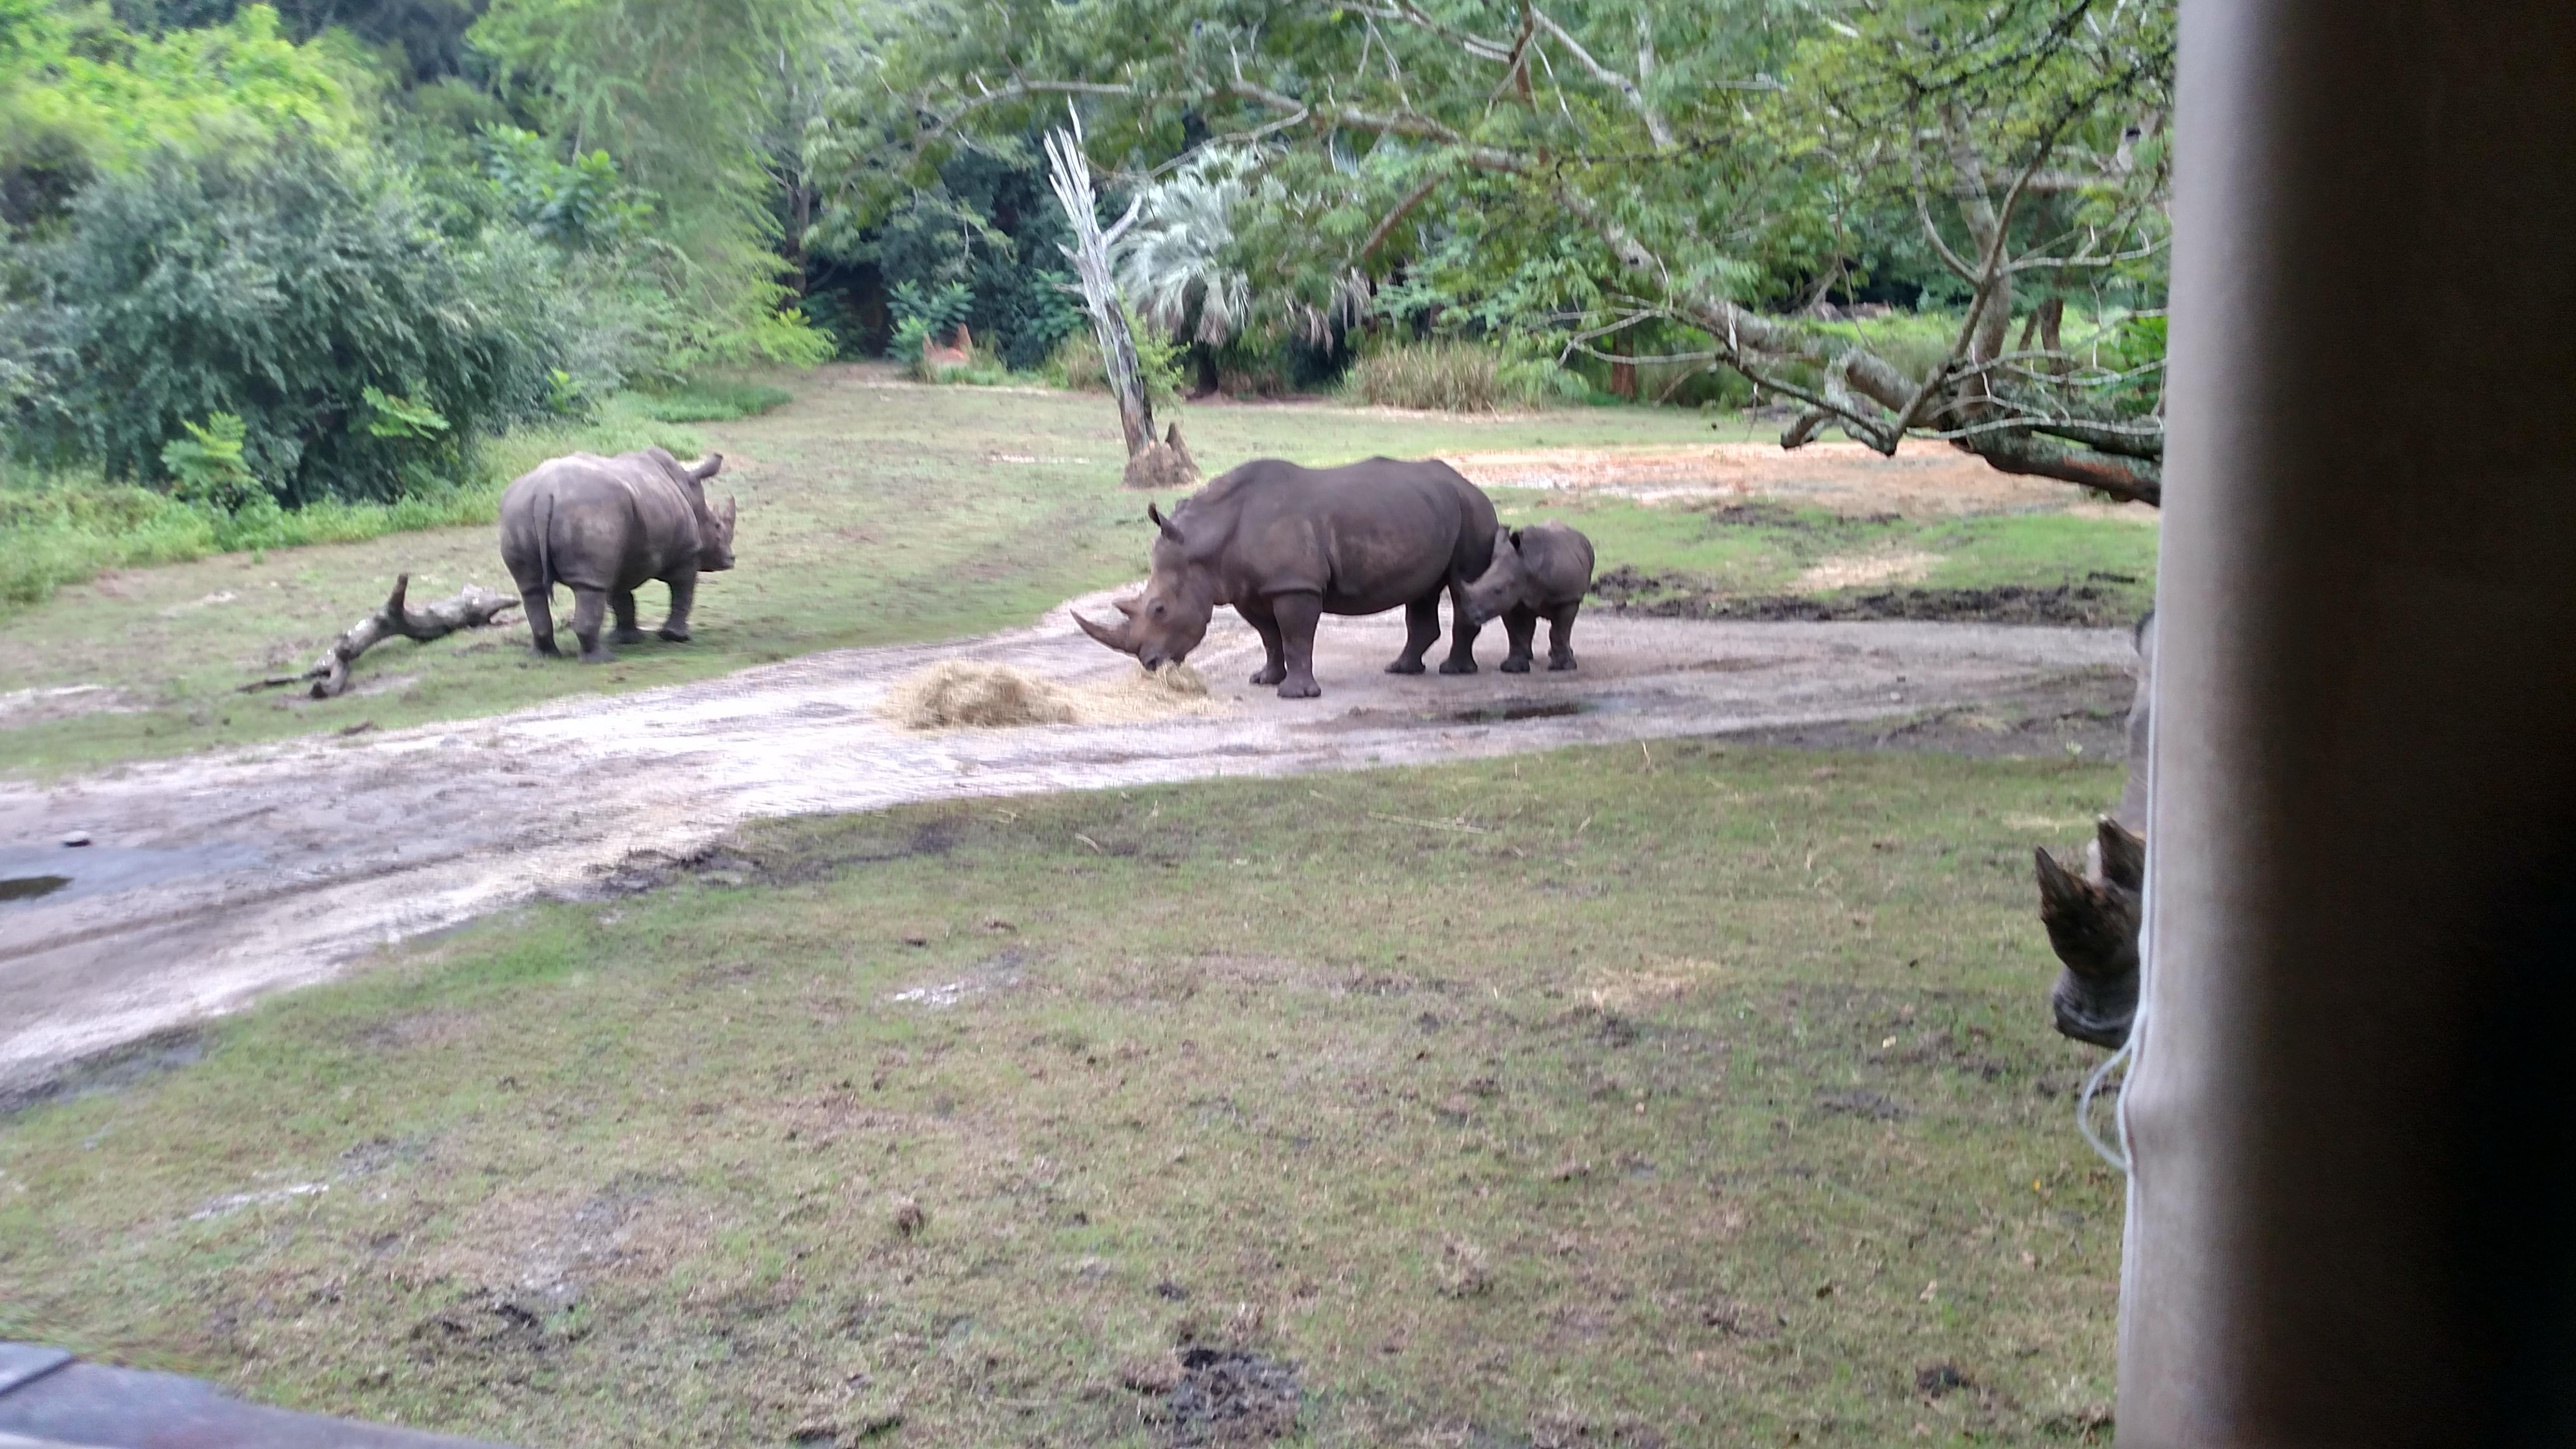 Rhinoceros enjoying the early morning temperatures